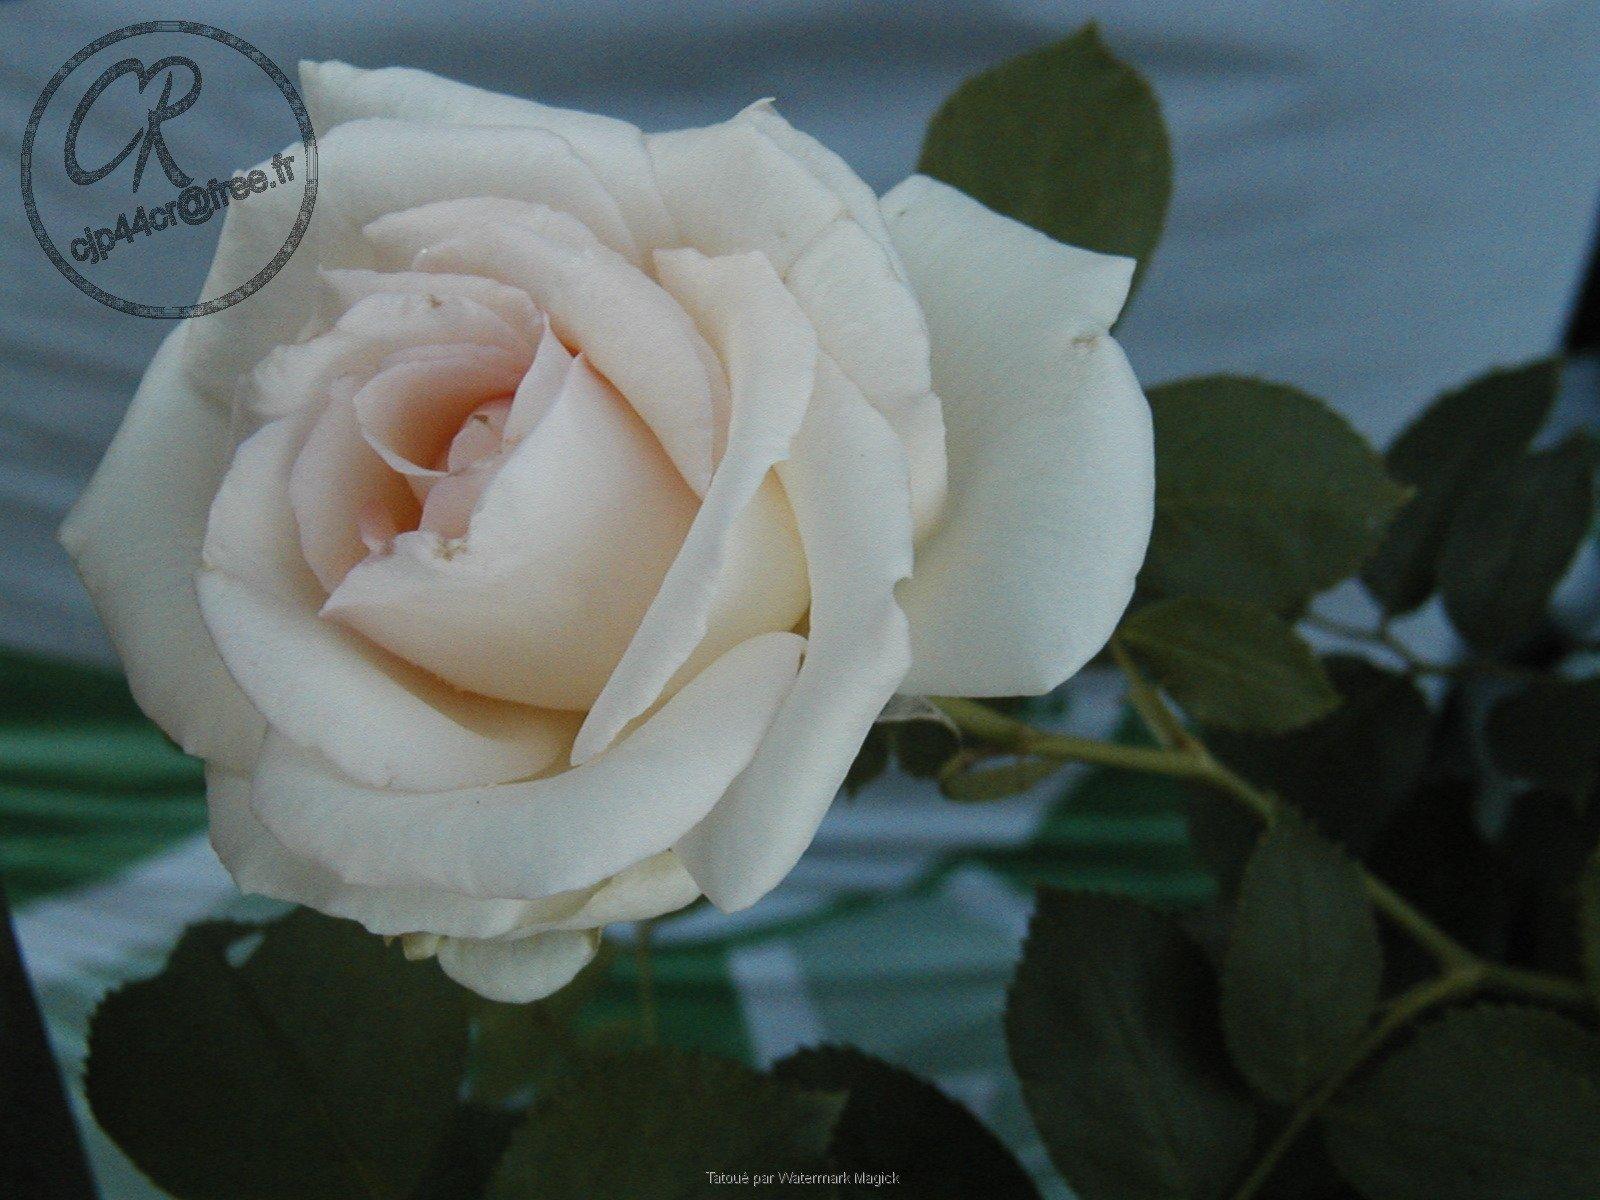 rosepalaisroyaldusoir02.jpg